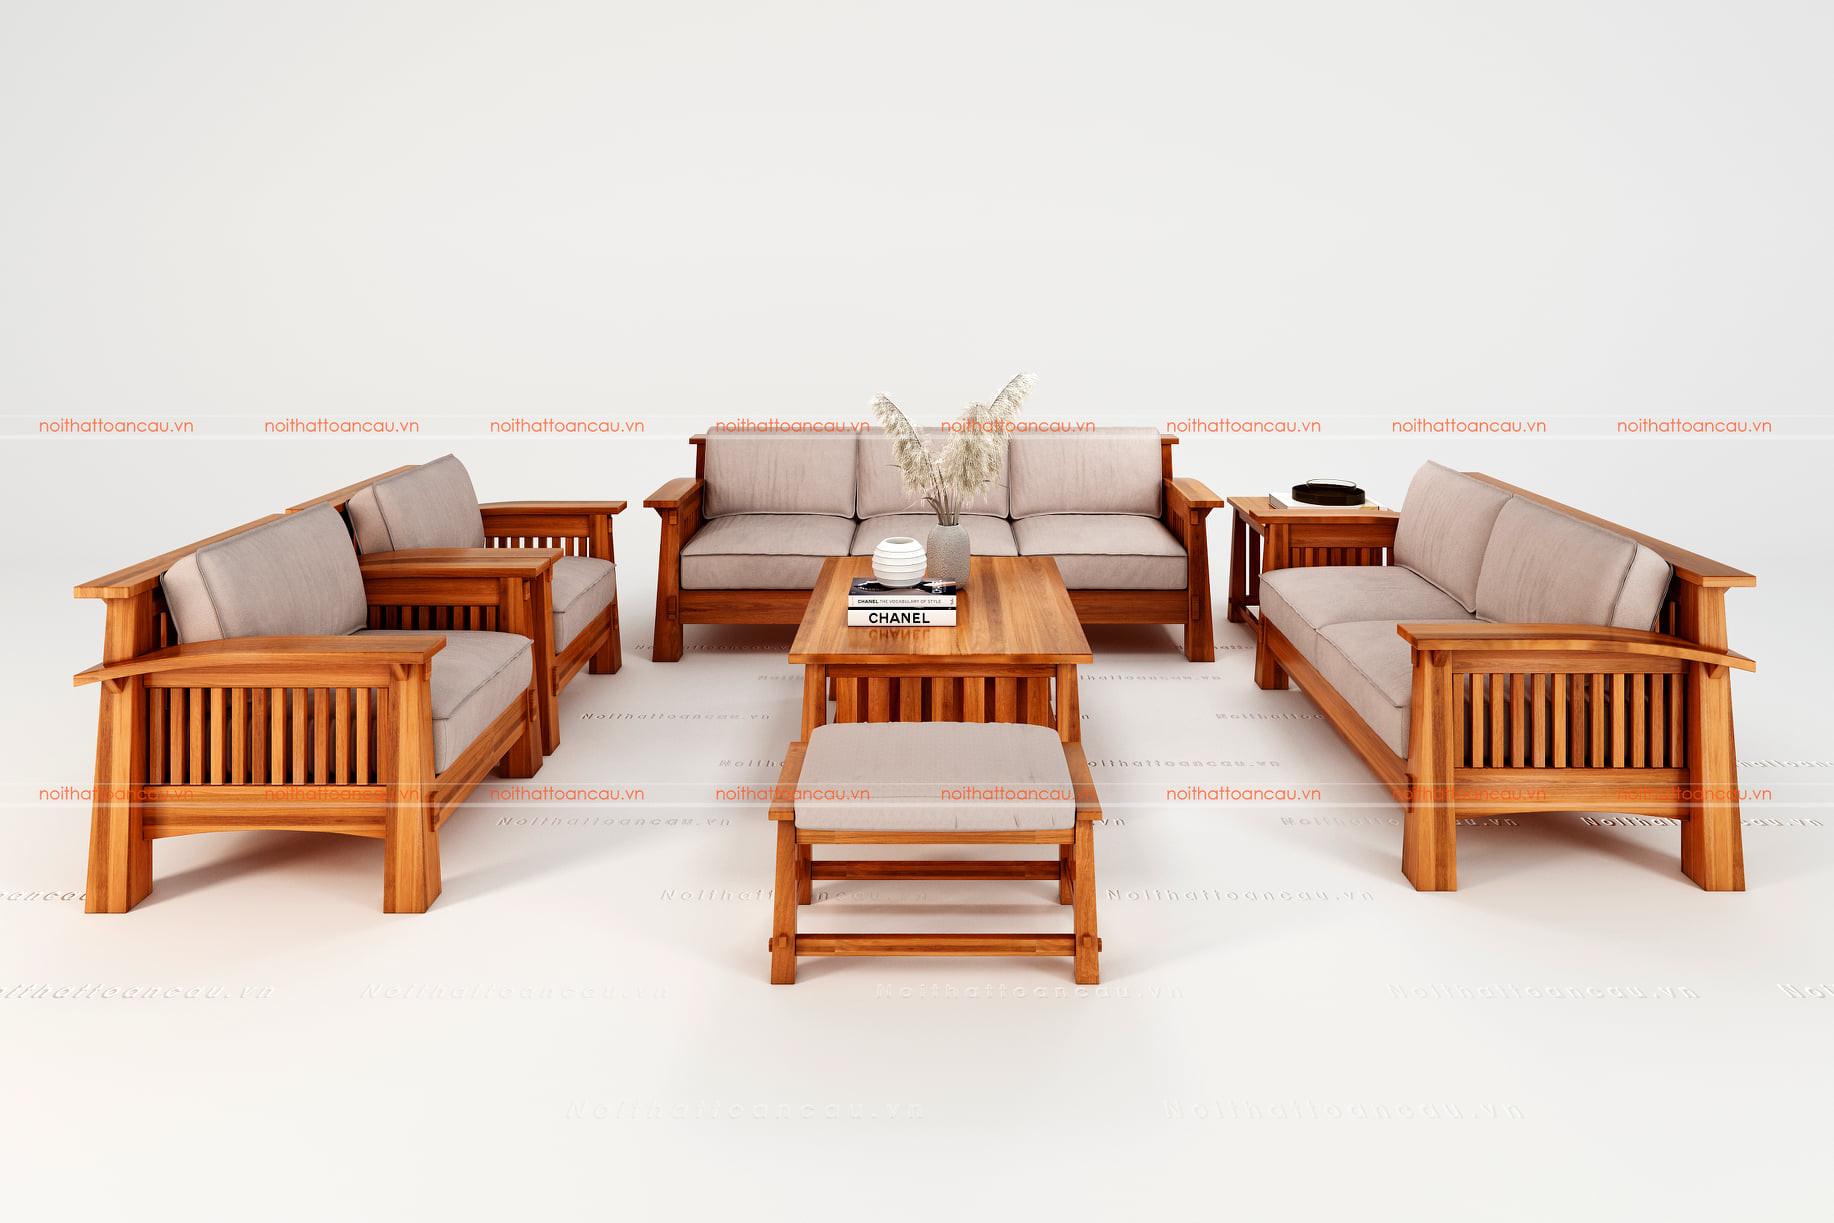 Bàn ghế gỗ gõ đỏ 18